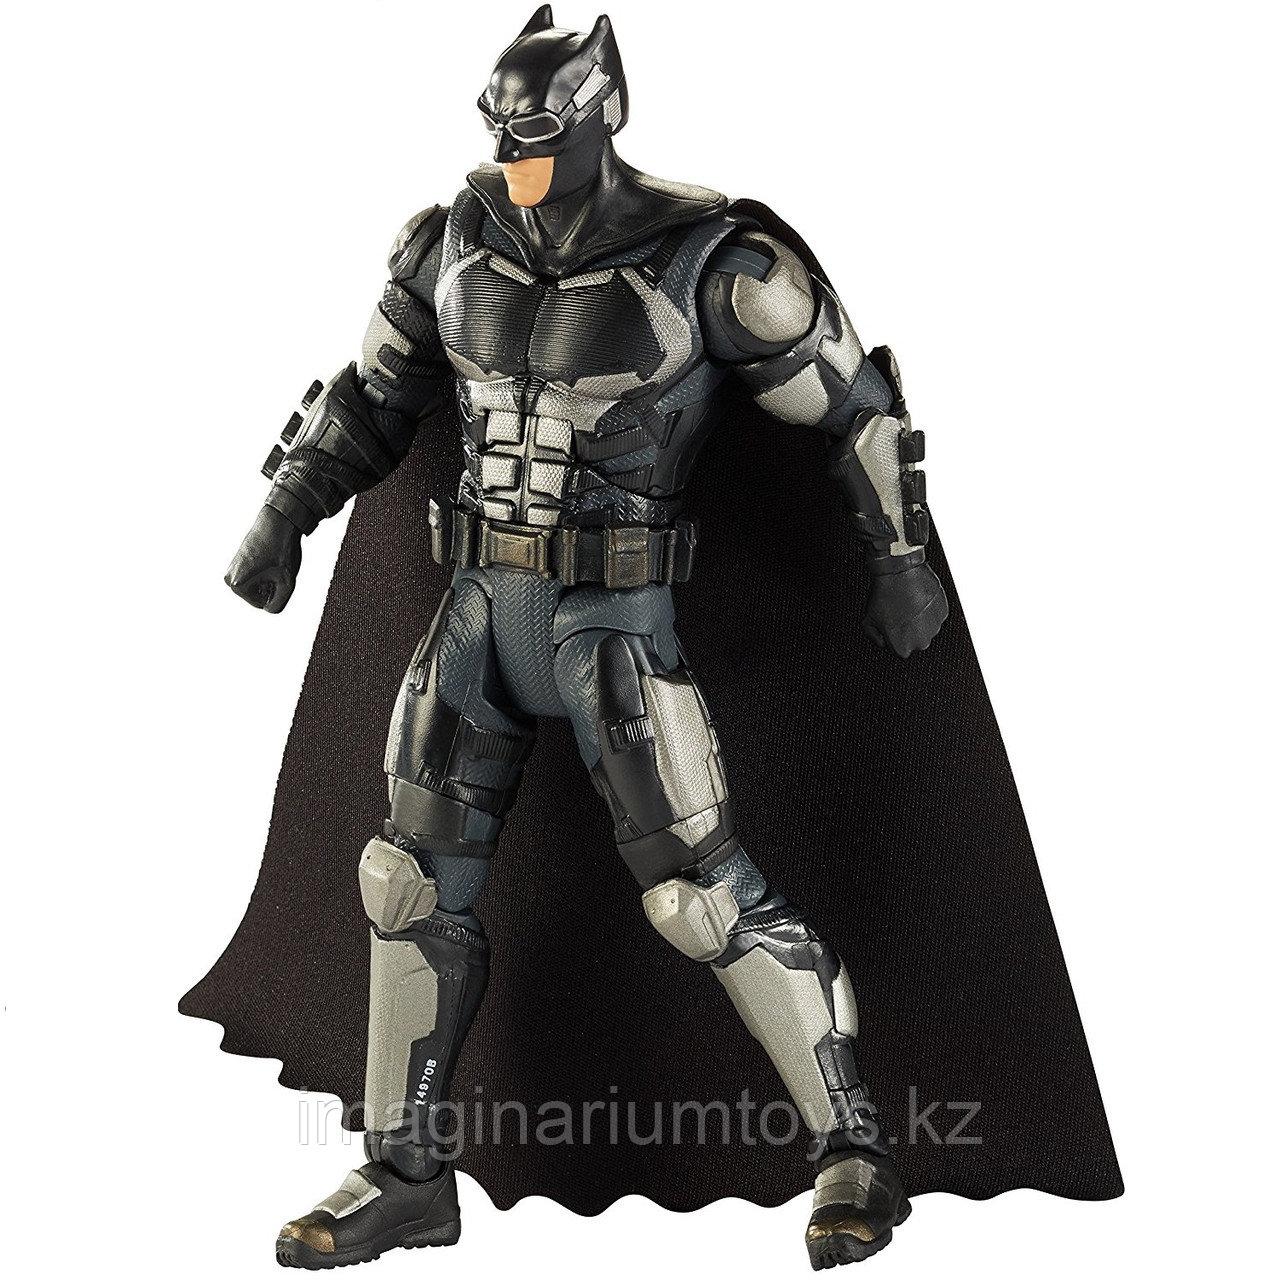 Фигурка «Бэтмен» Batman 15 см